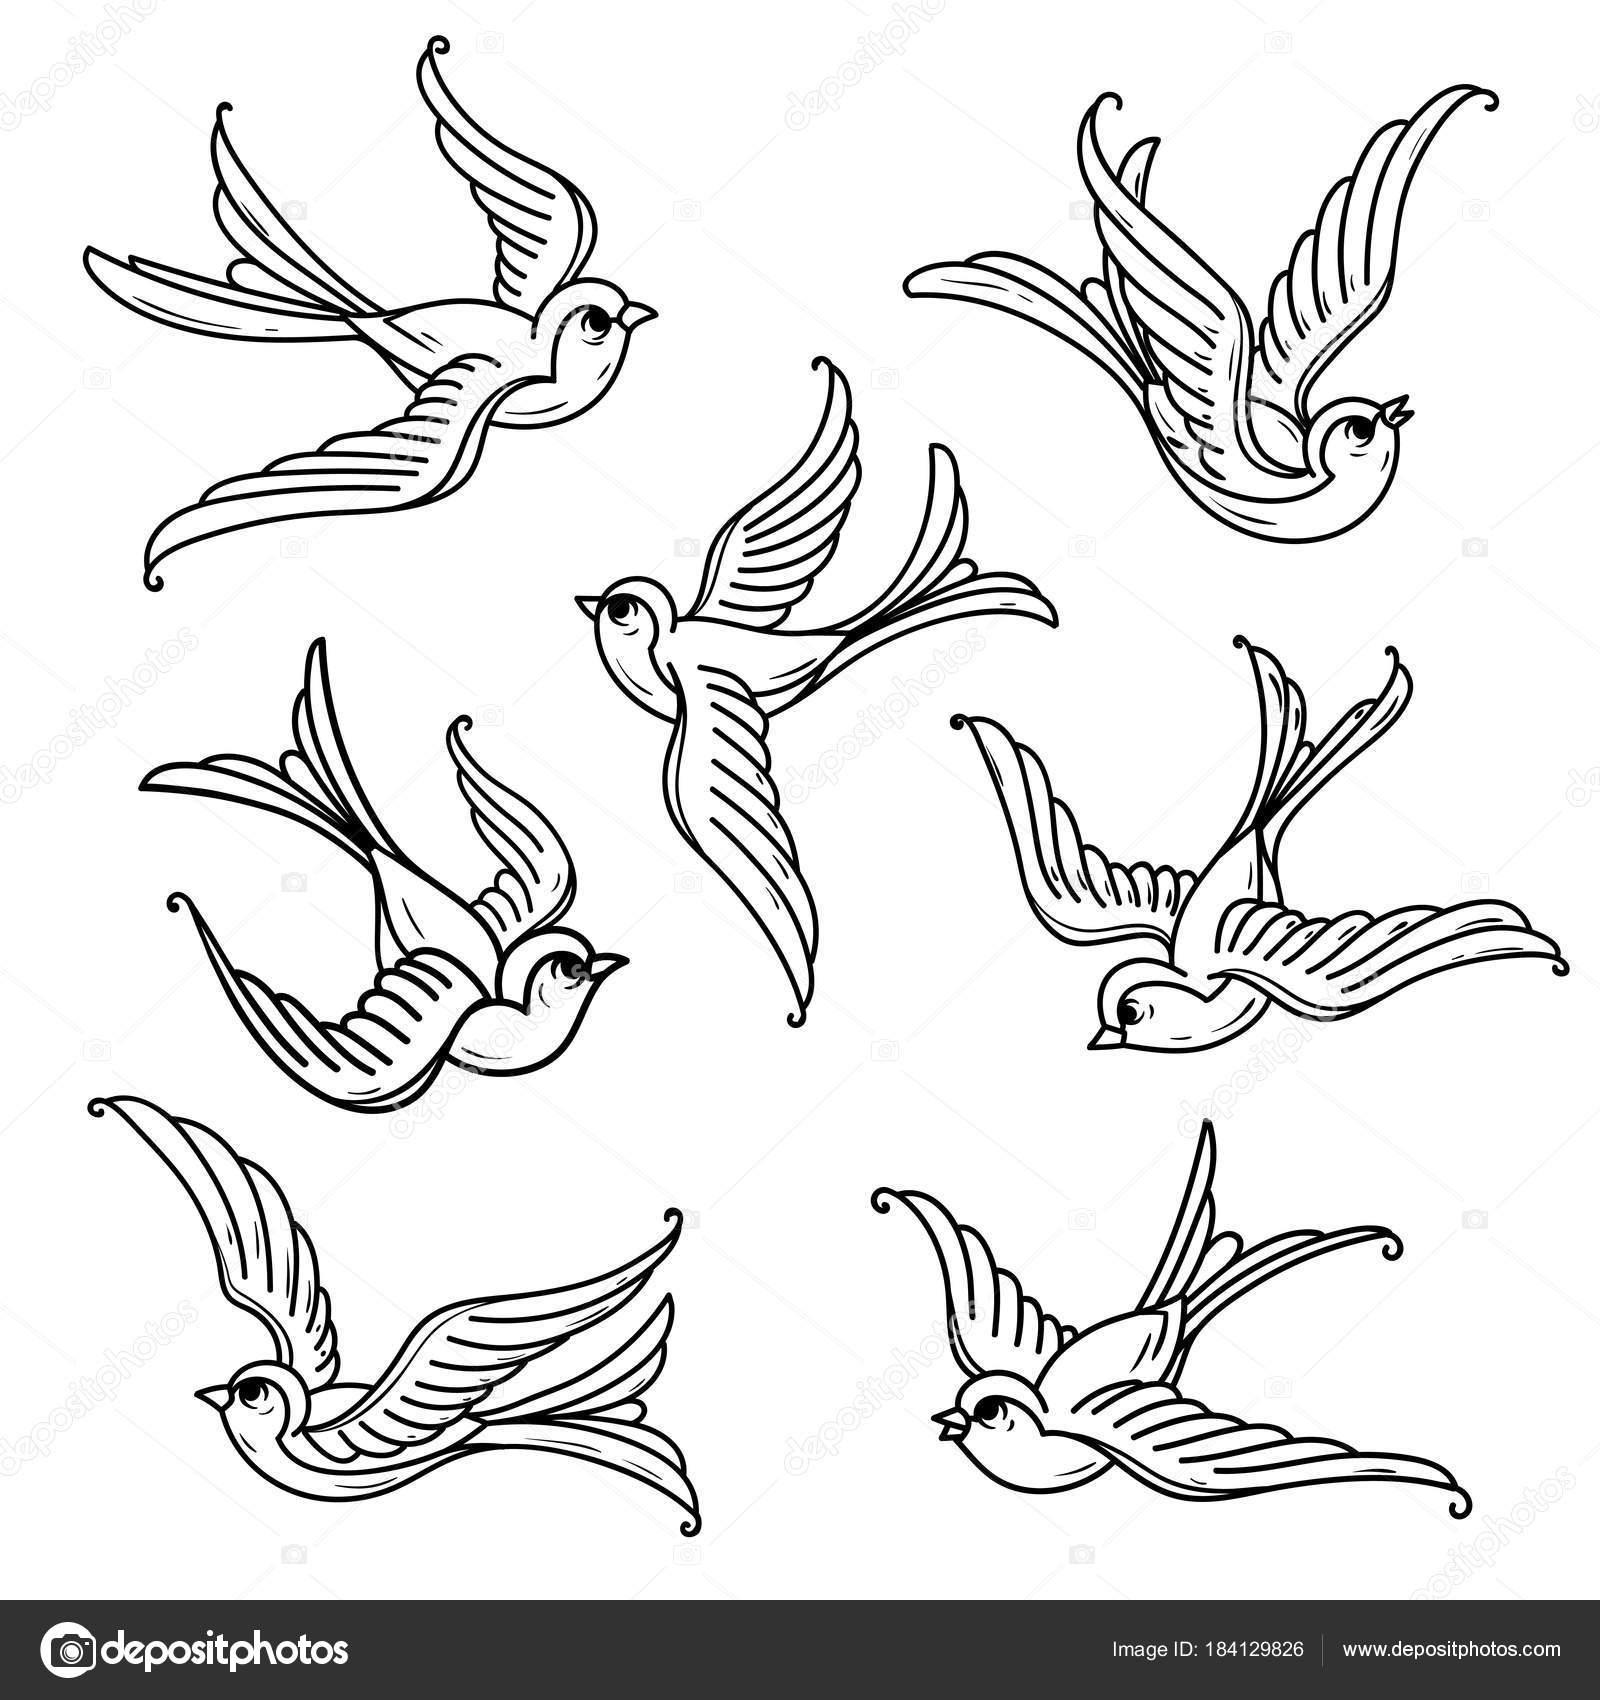 Set of flying bluebirds free birdsmbol of hope stock vector set of flying bluebirds free birdsmbol of hope stock vector buycottarizona Image collections